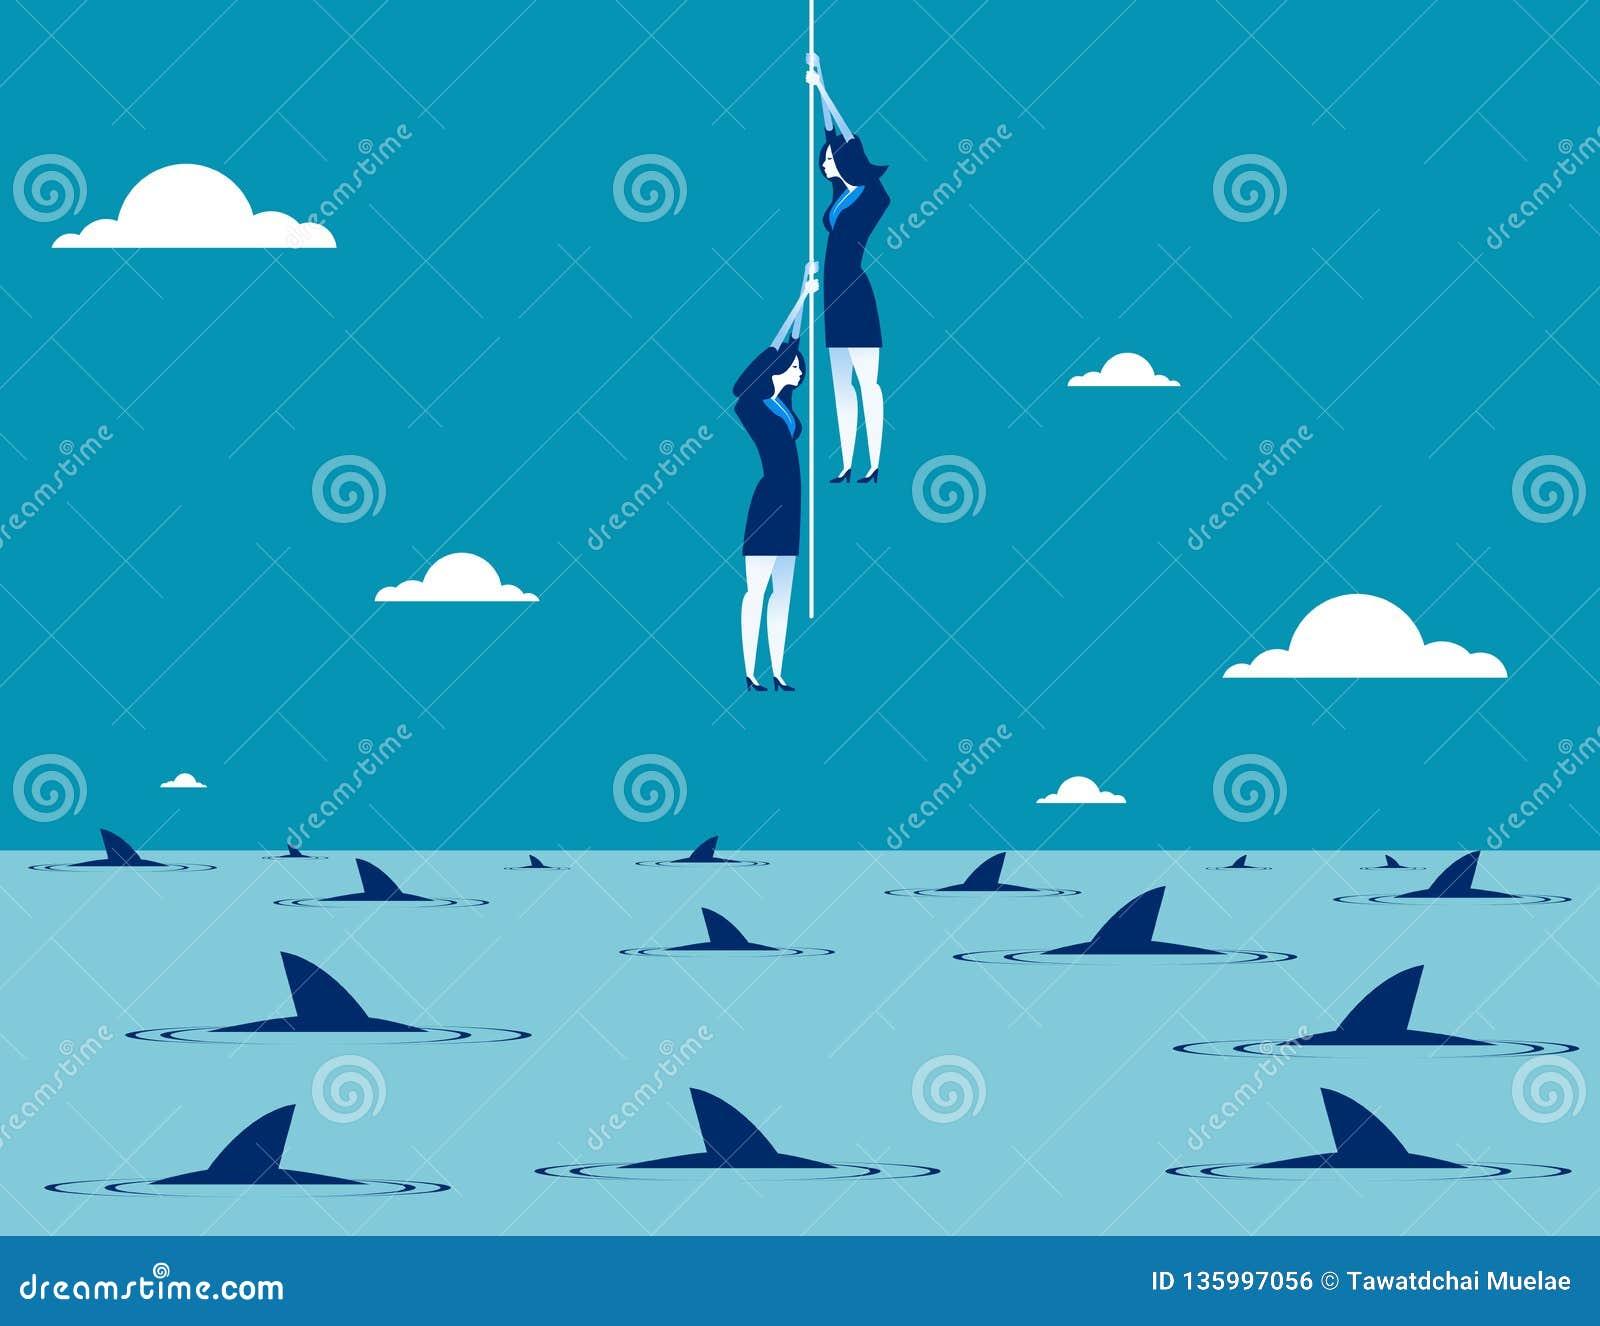 Business taking risks. Concept business vector illustration